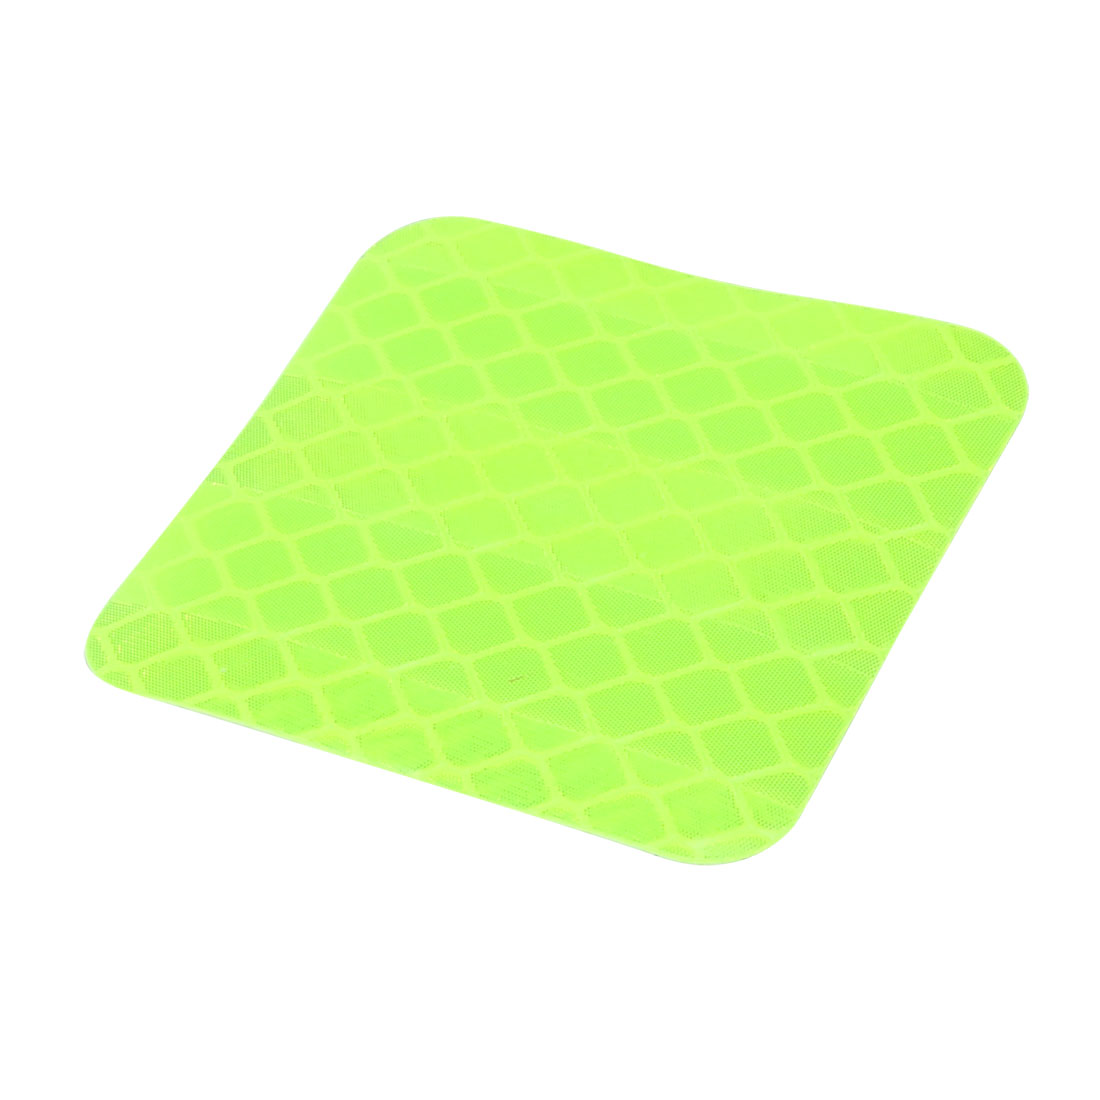 Honeycomb Reflective Warning Tape Film Sticker Light Yellow 40mm x 40mm